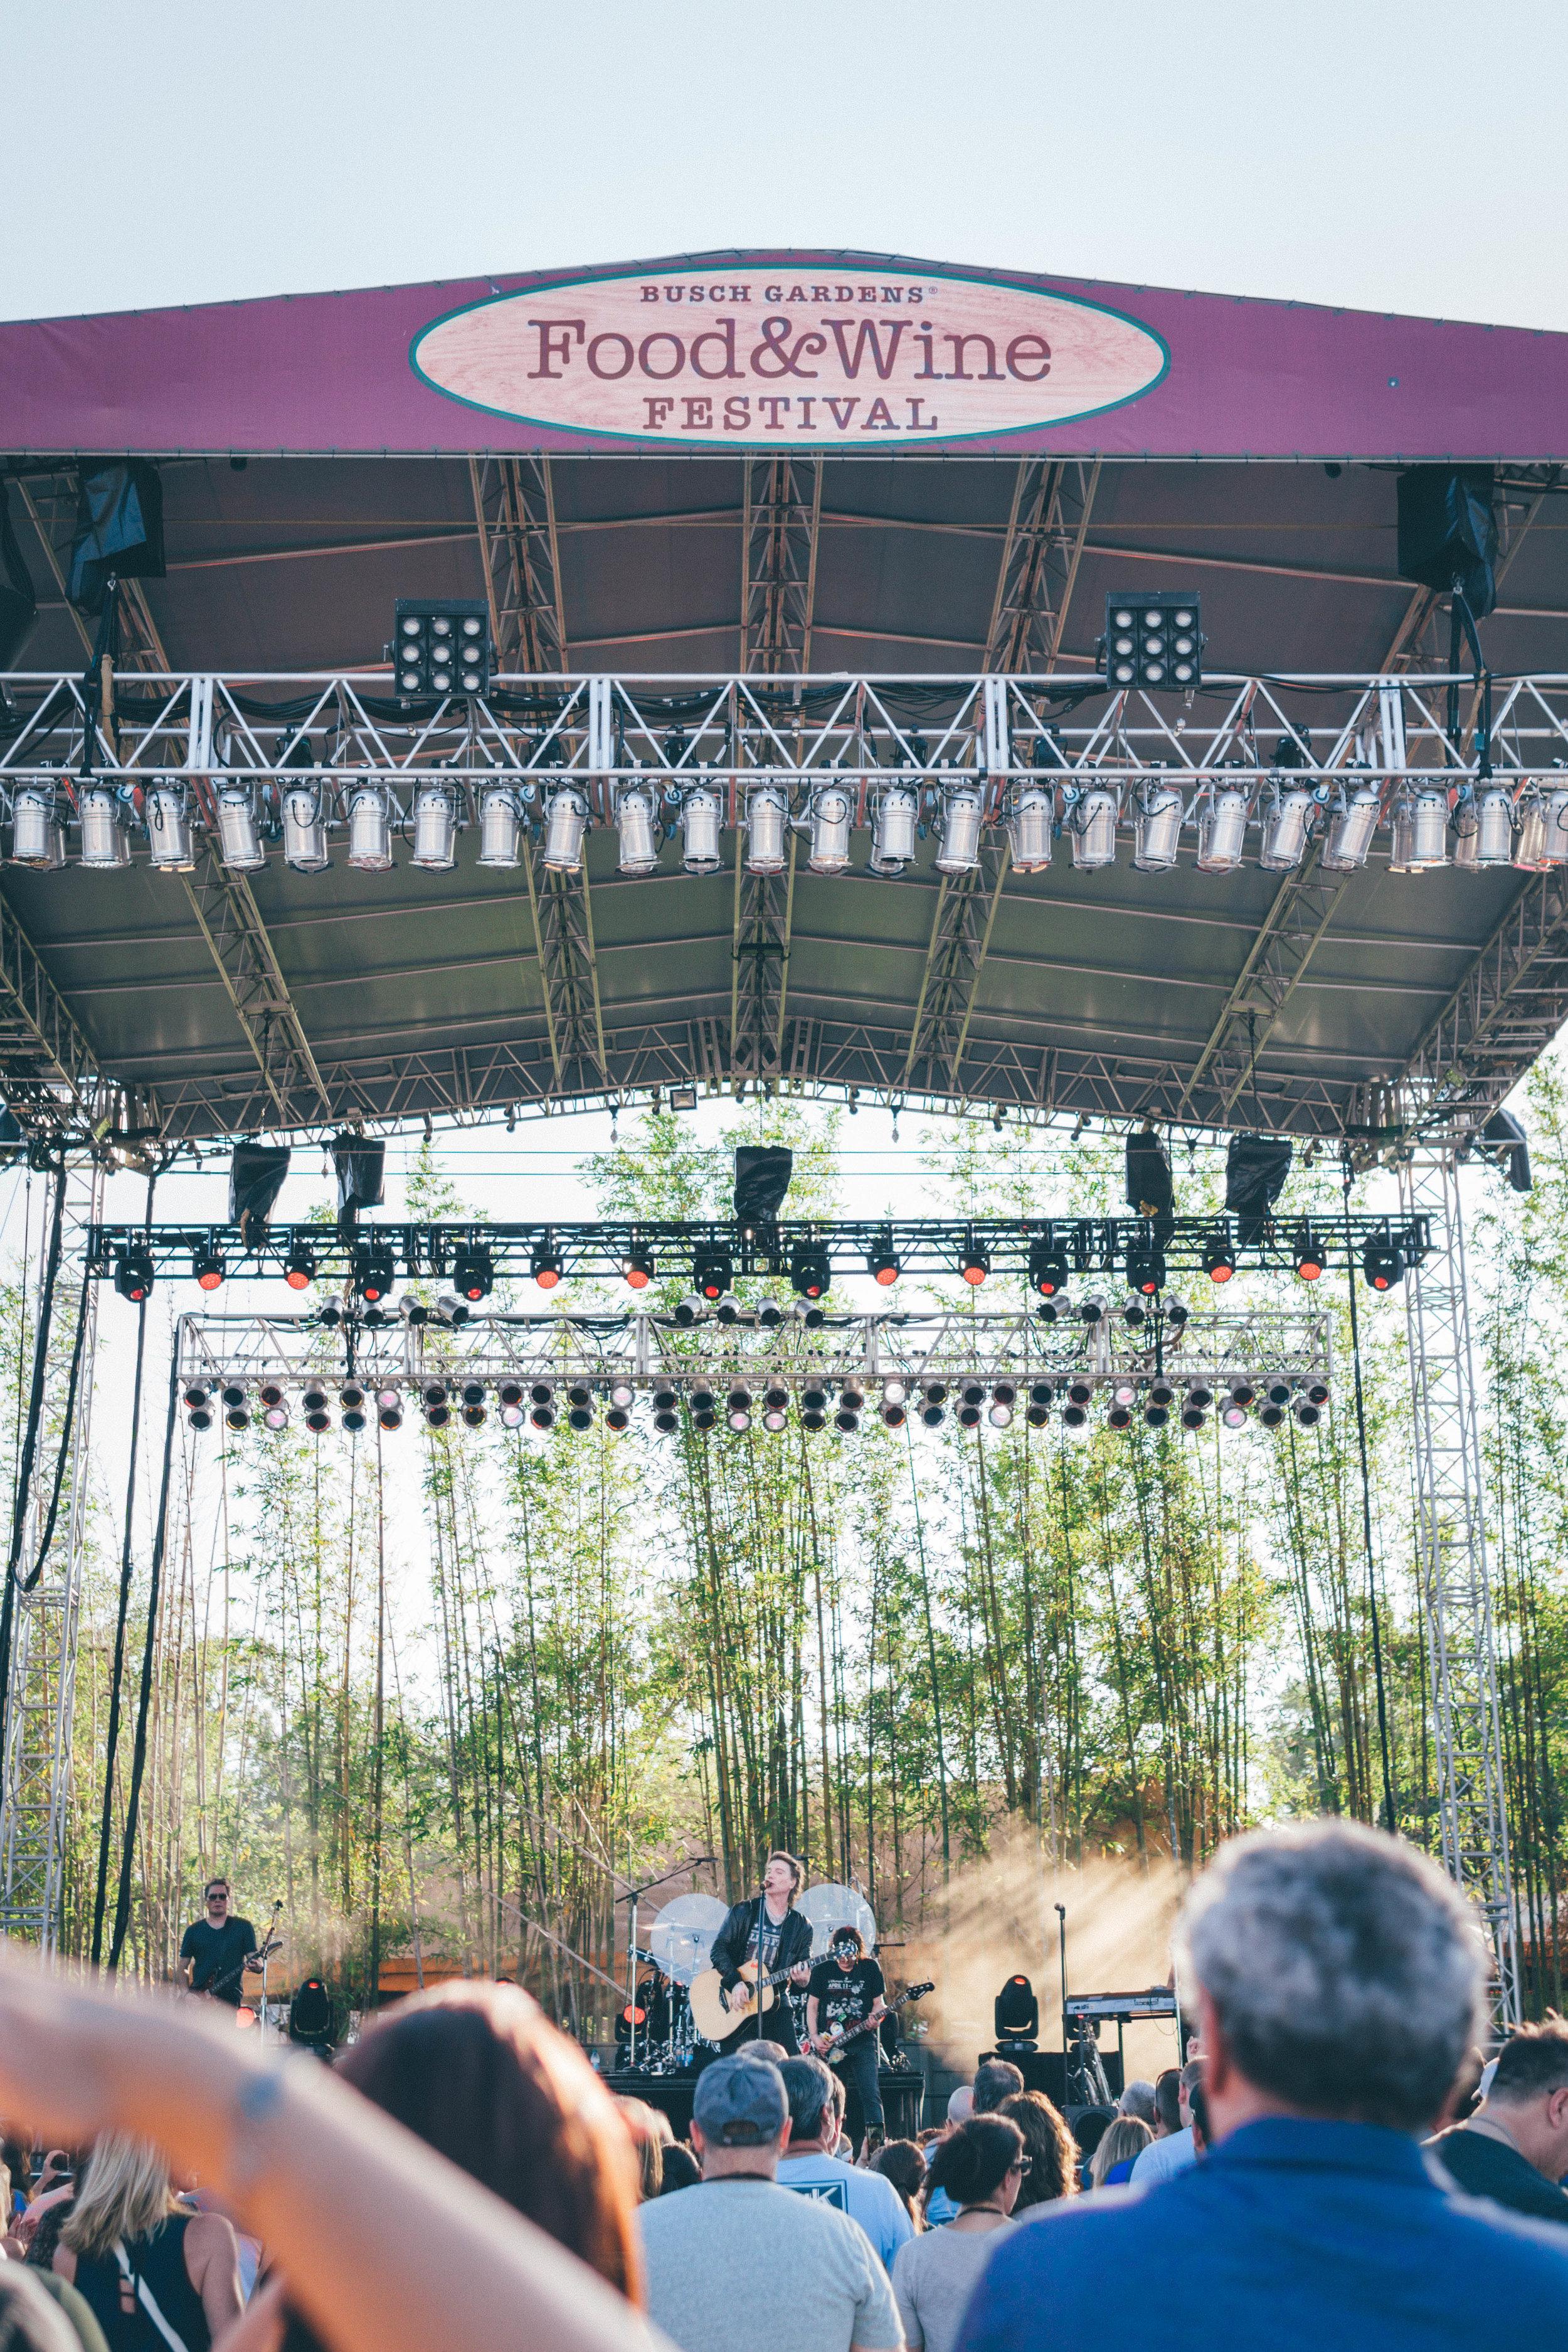 This Jenn Girl - Tampa Blogger - Busch Gardens Food & Wine Festival 6